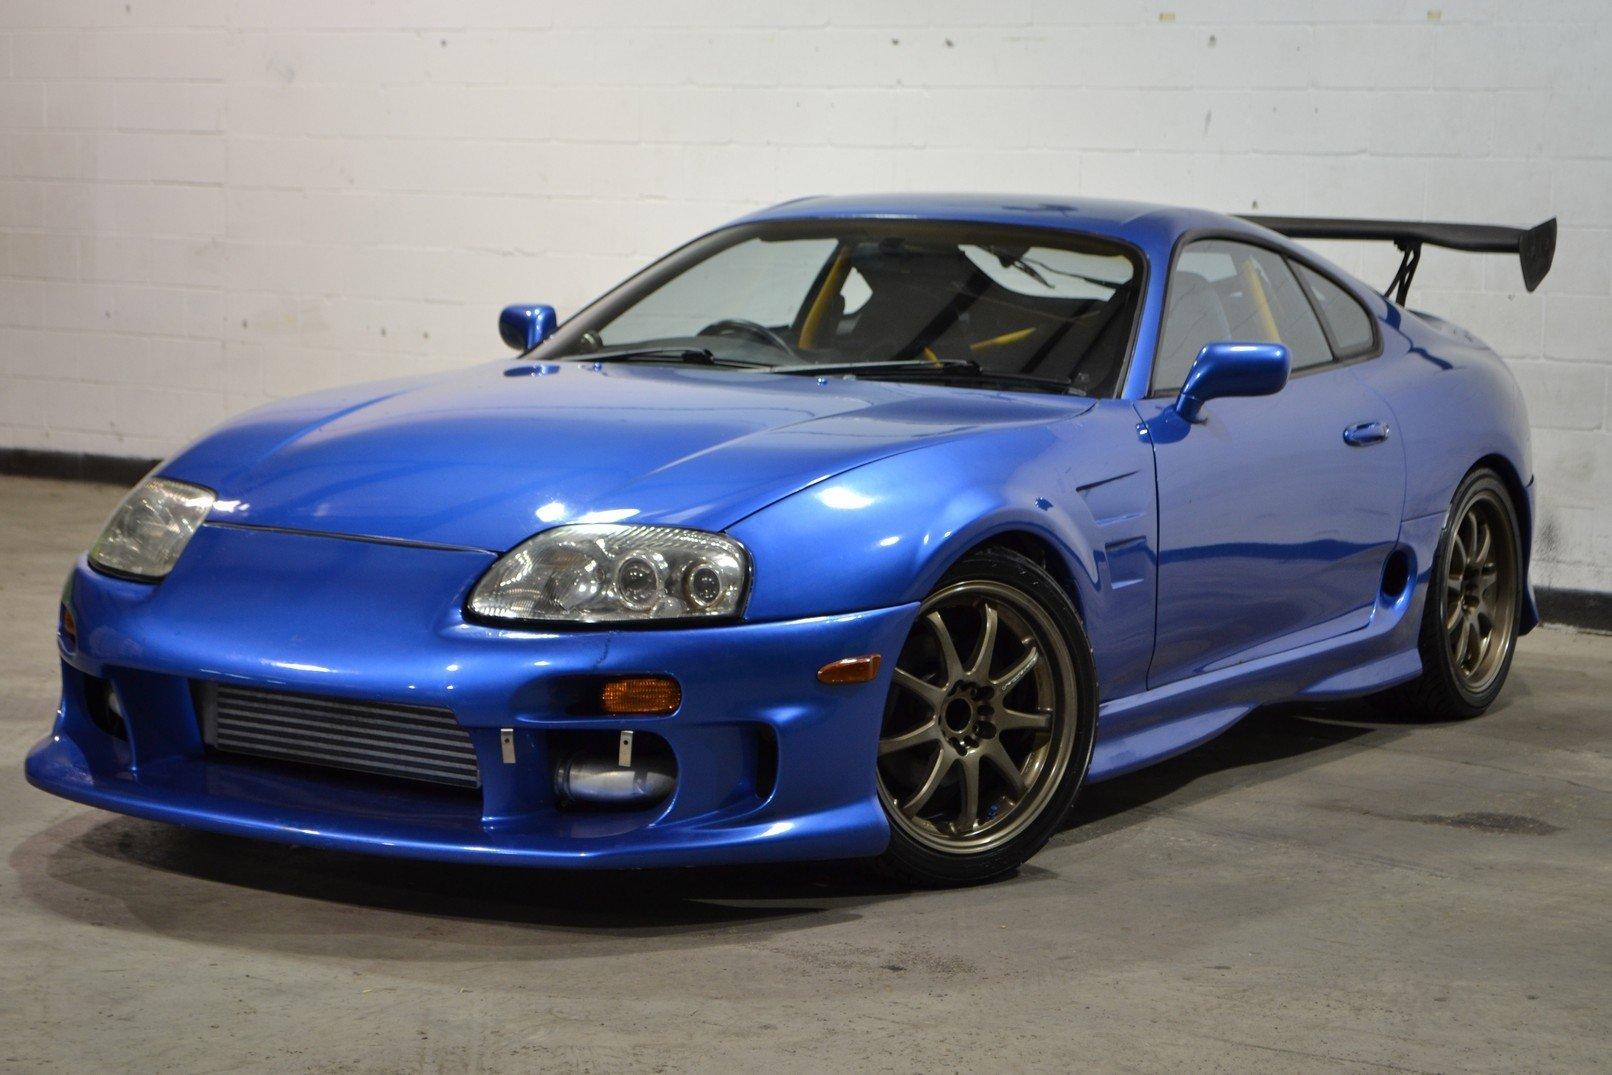 1993 toyota supra turbo 6 speed